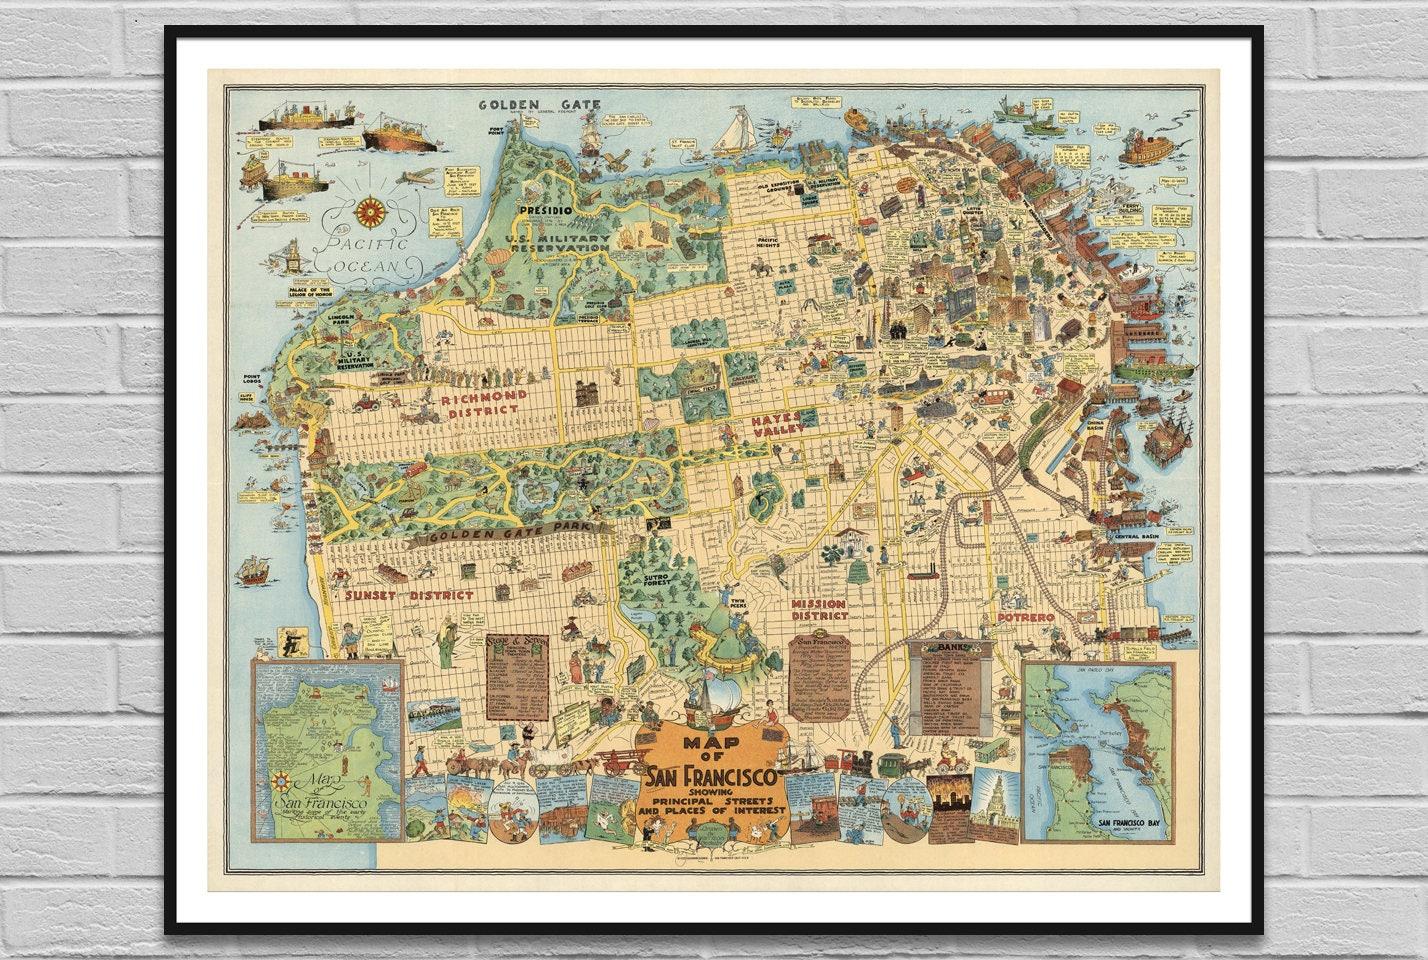 Map of San Francisco USA / vintage old map poster / big large | Etsy